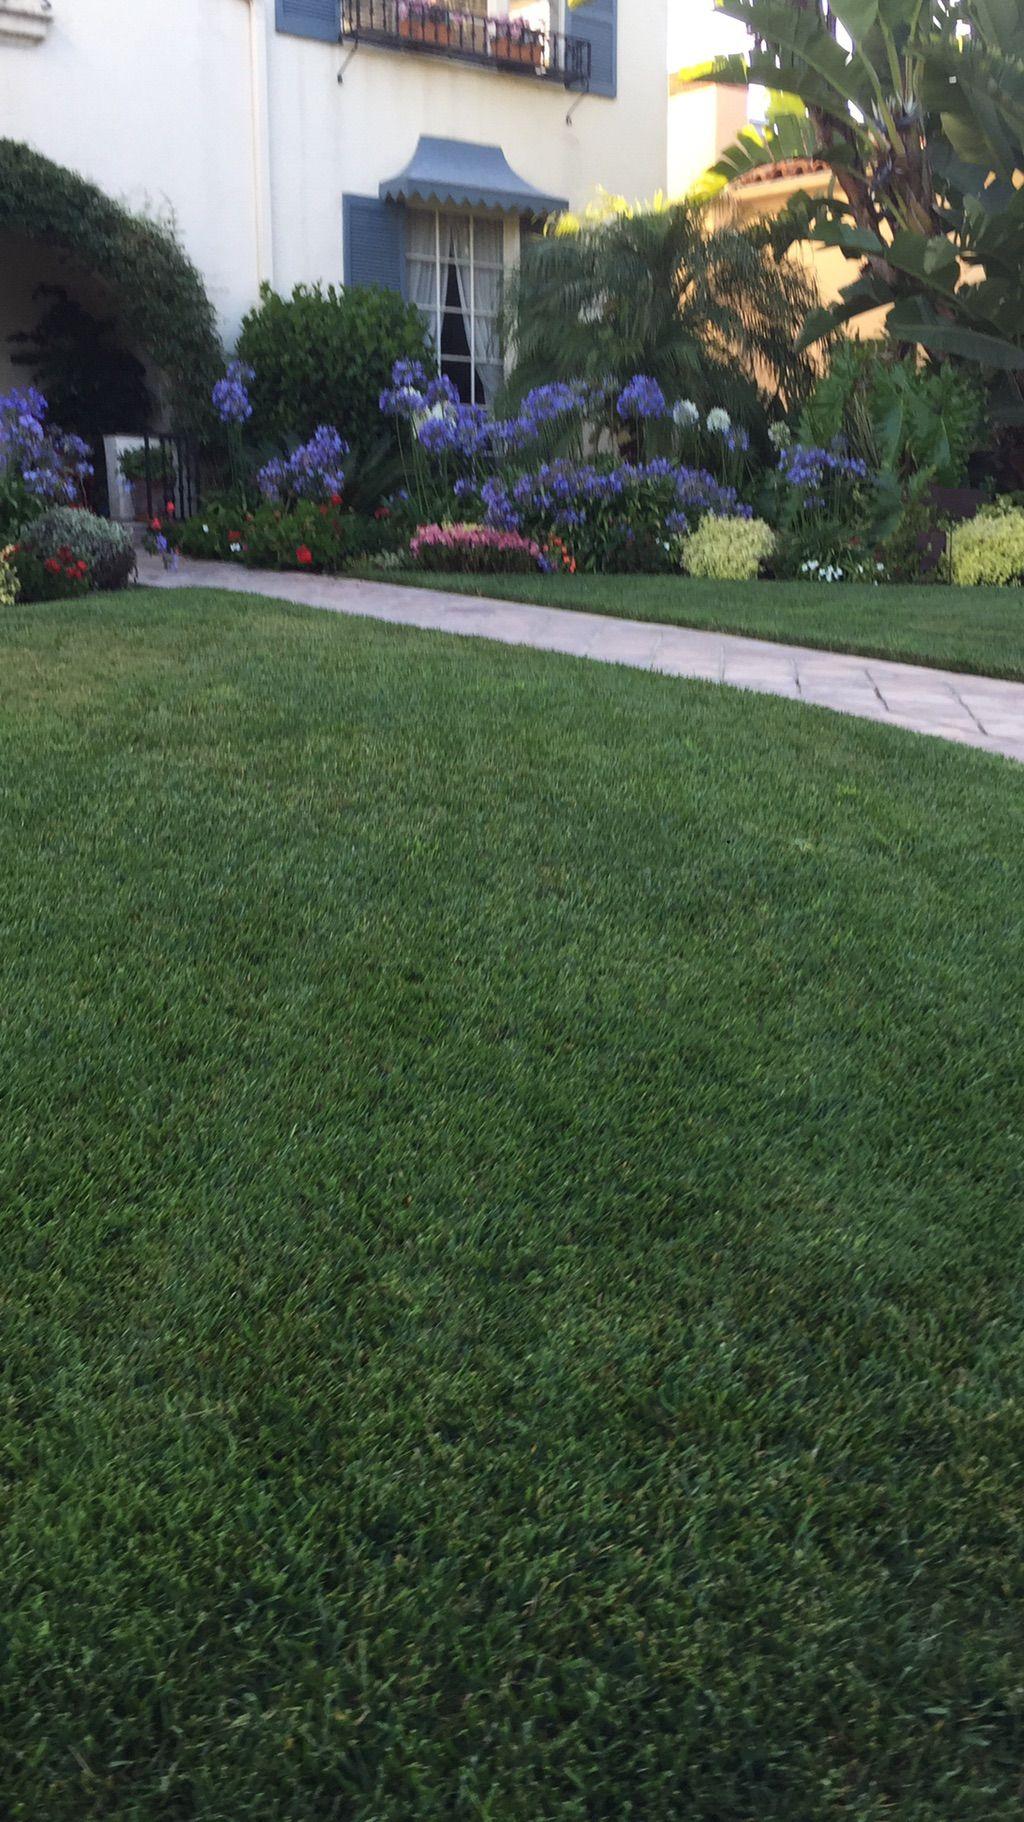 Delgado gardening service LLC